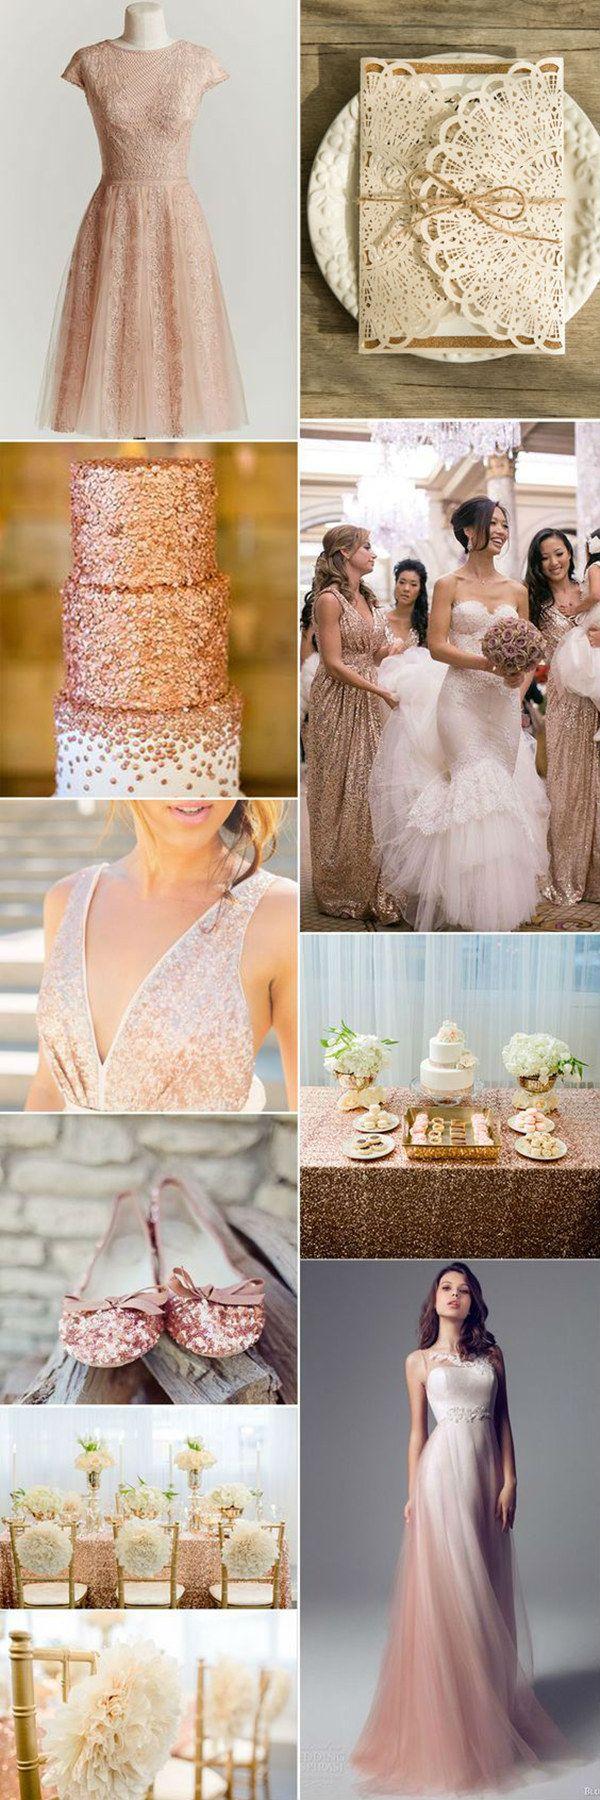 373 Best Spring Wedding Invitations Images On Pinterest Spring